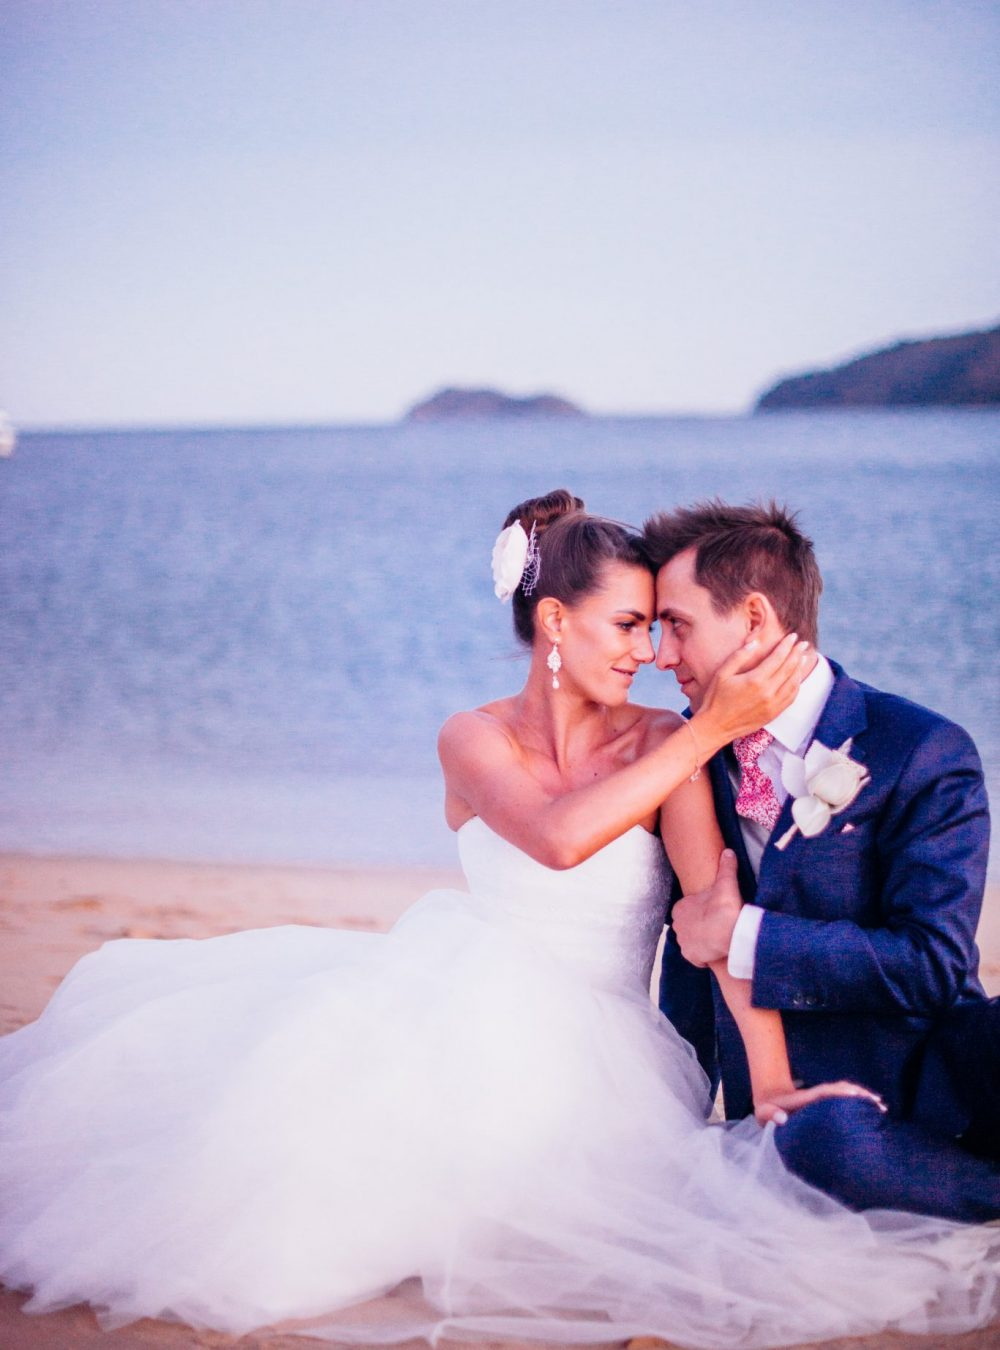 simone-jakub-patonga-beach-wedding-fotograf-photographer-weddingphotographer-martina-lundborg-763